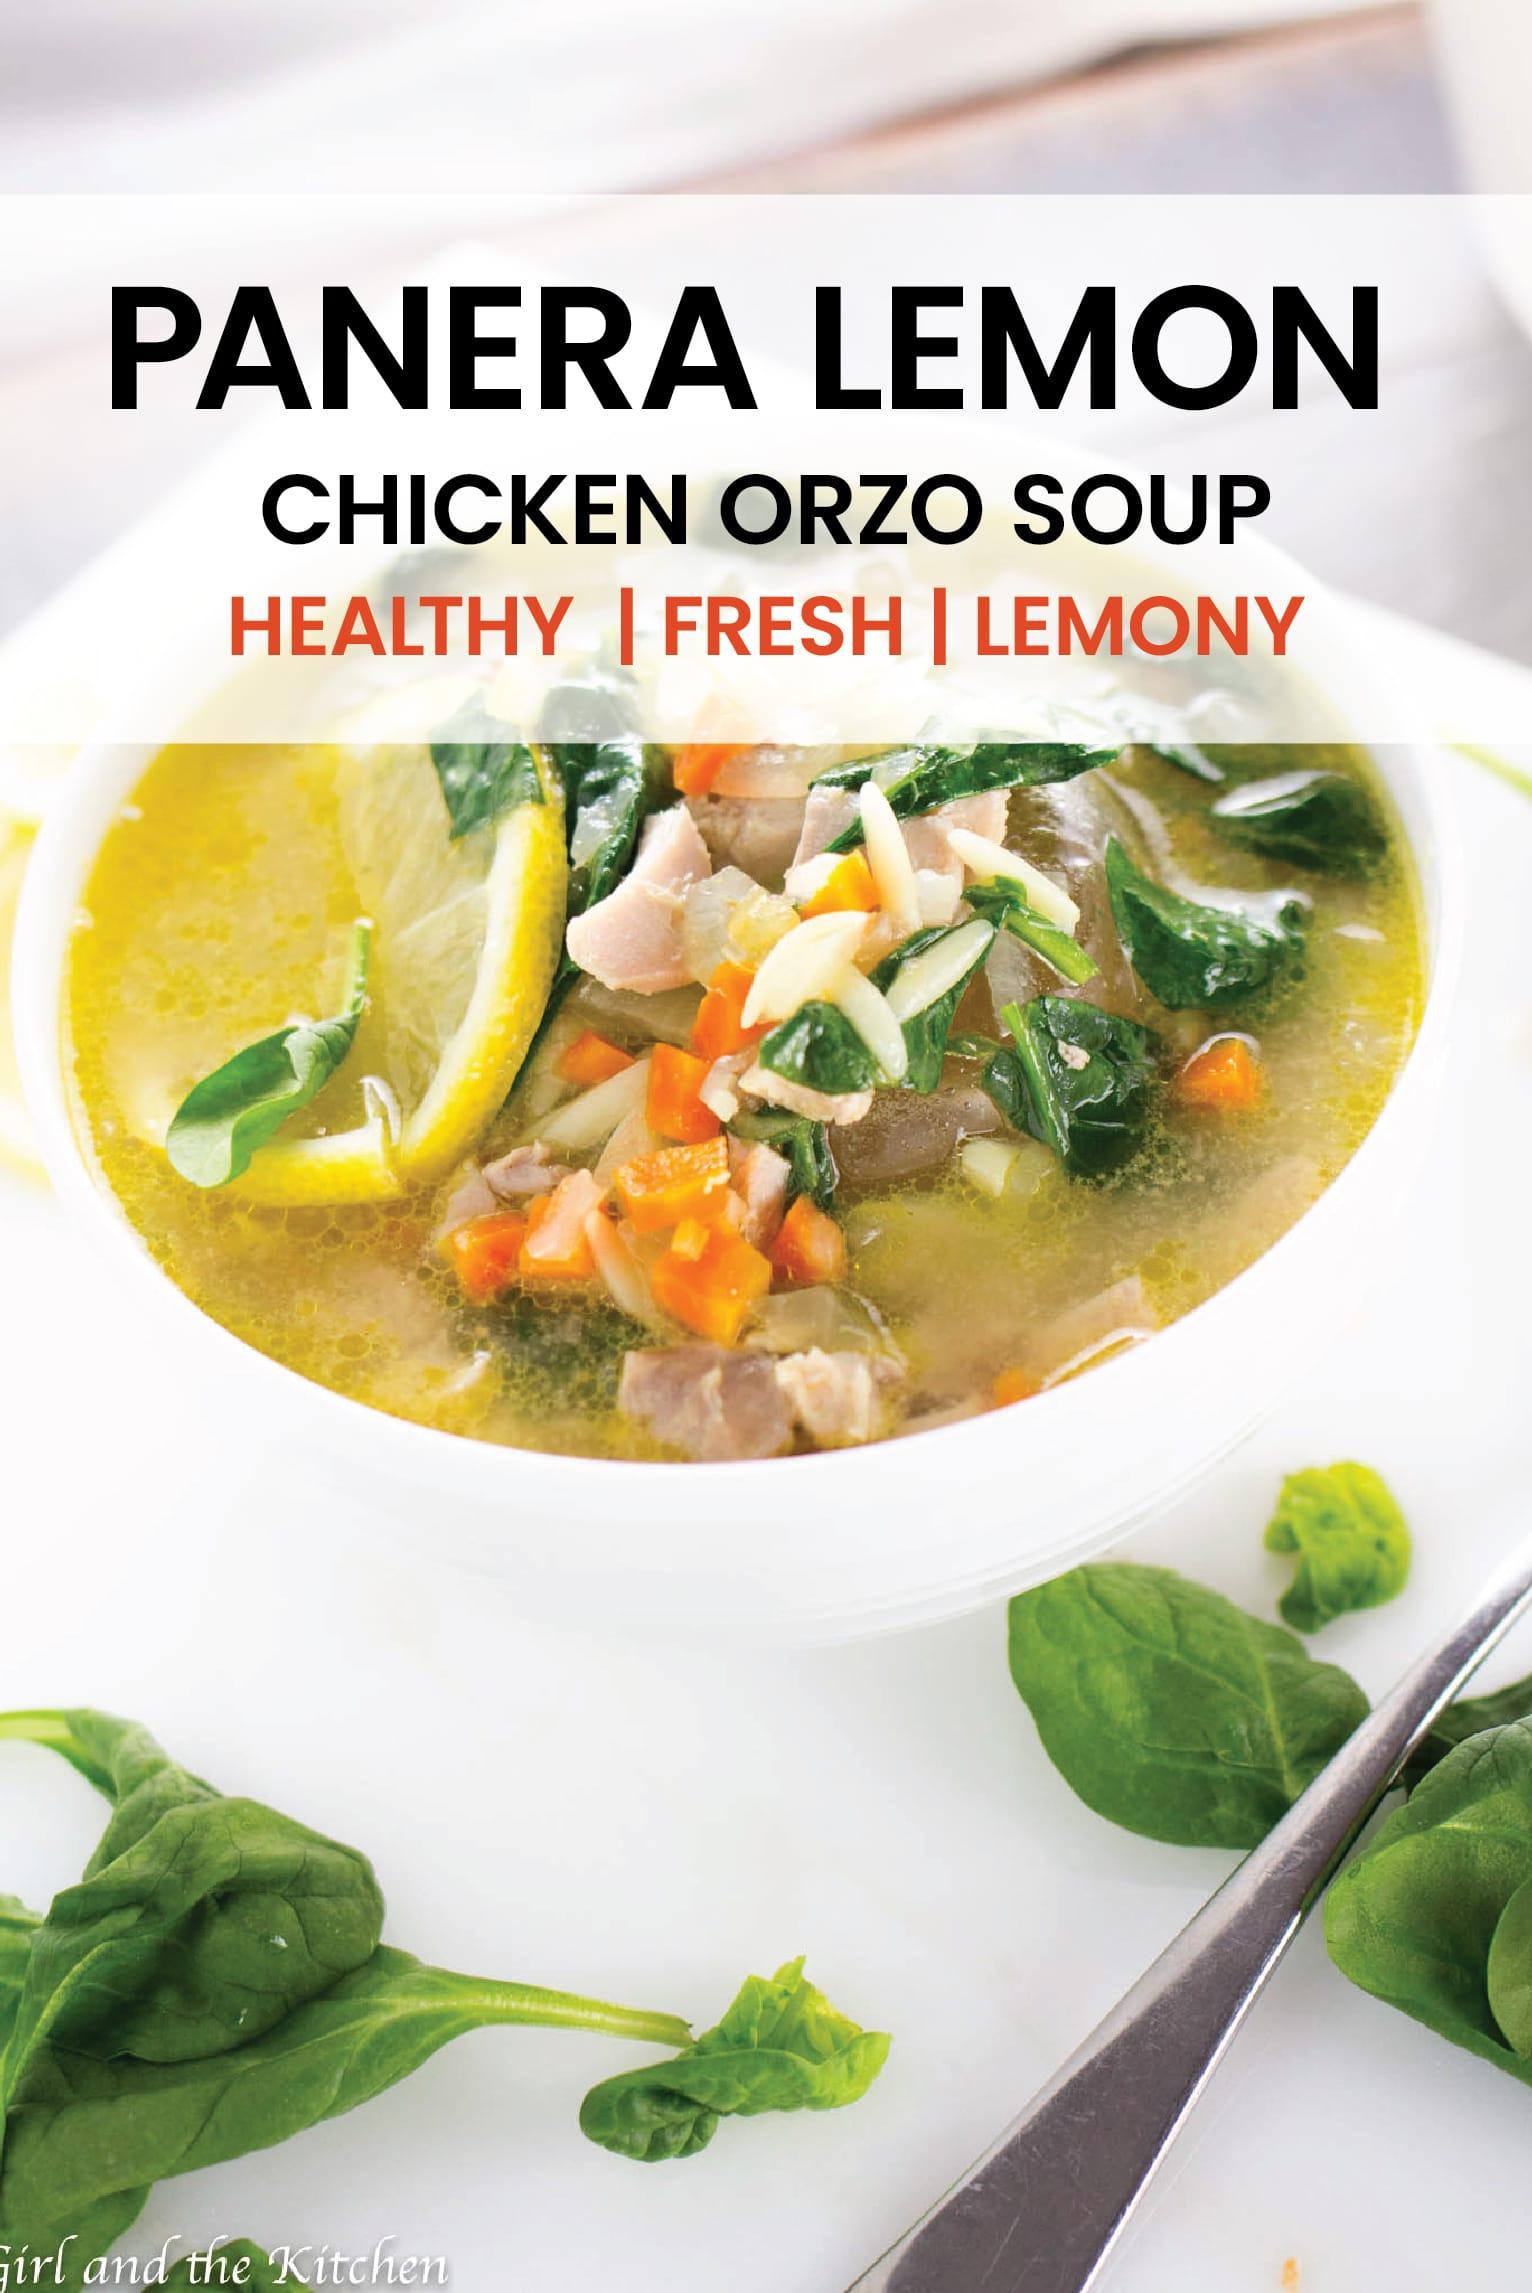 A perfect take on the popular Panera Lemon Chicken Orzo soup!